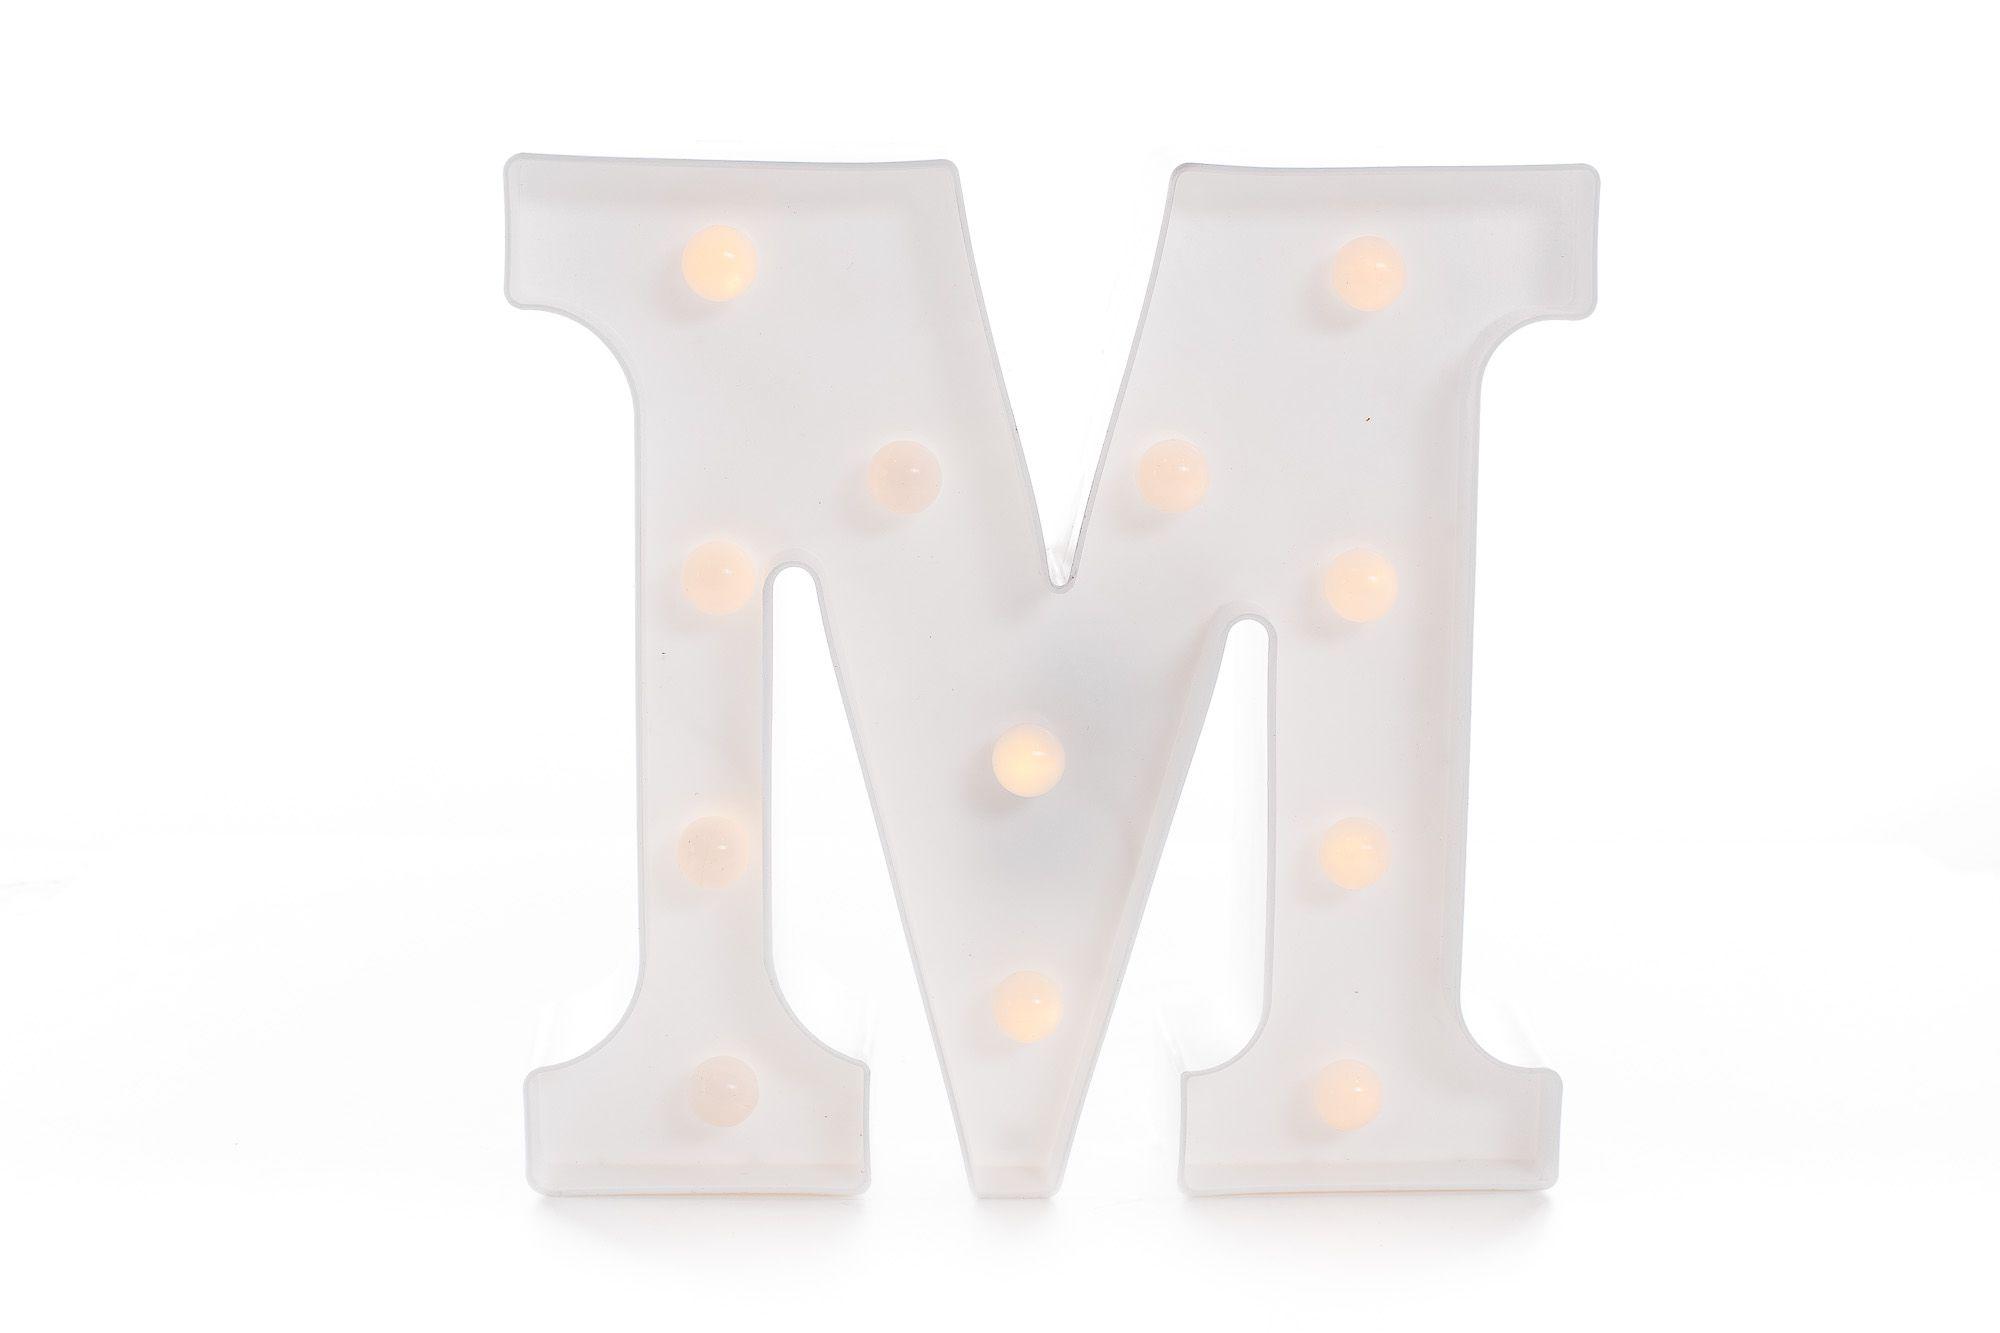 Letras Luminosas Led Branca